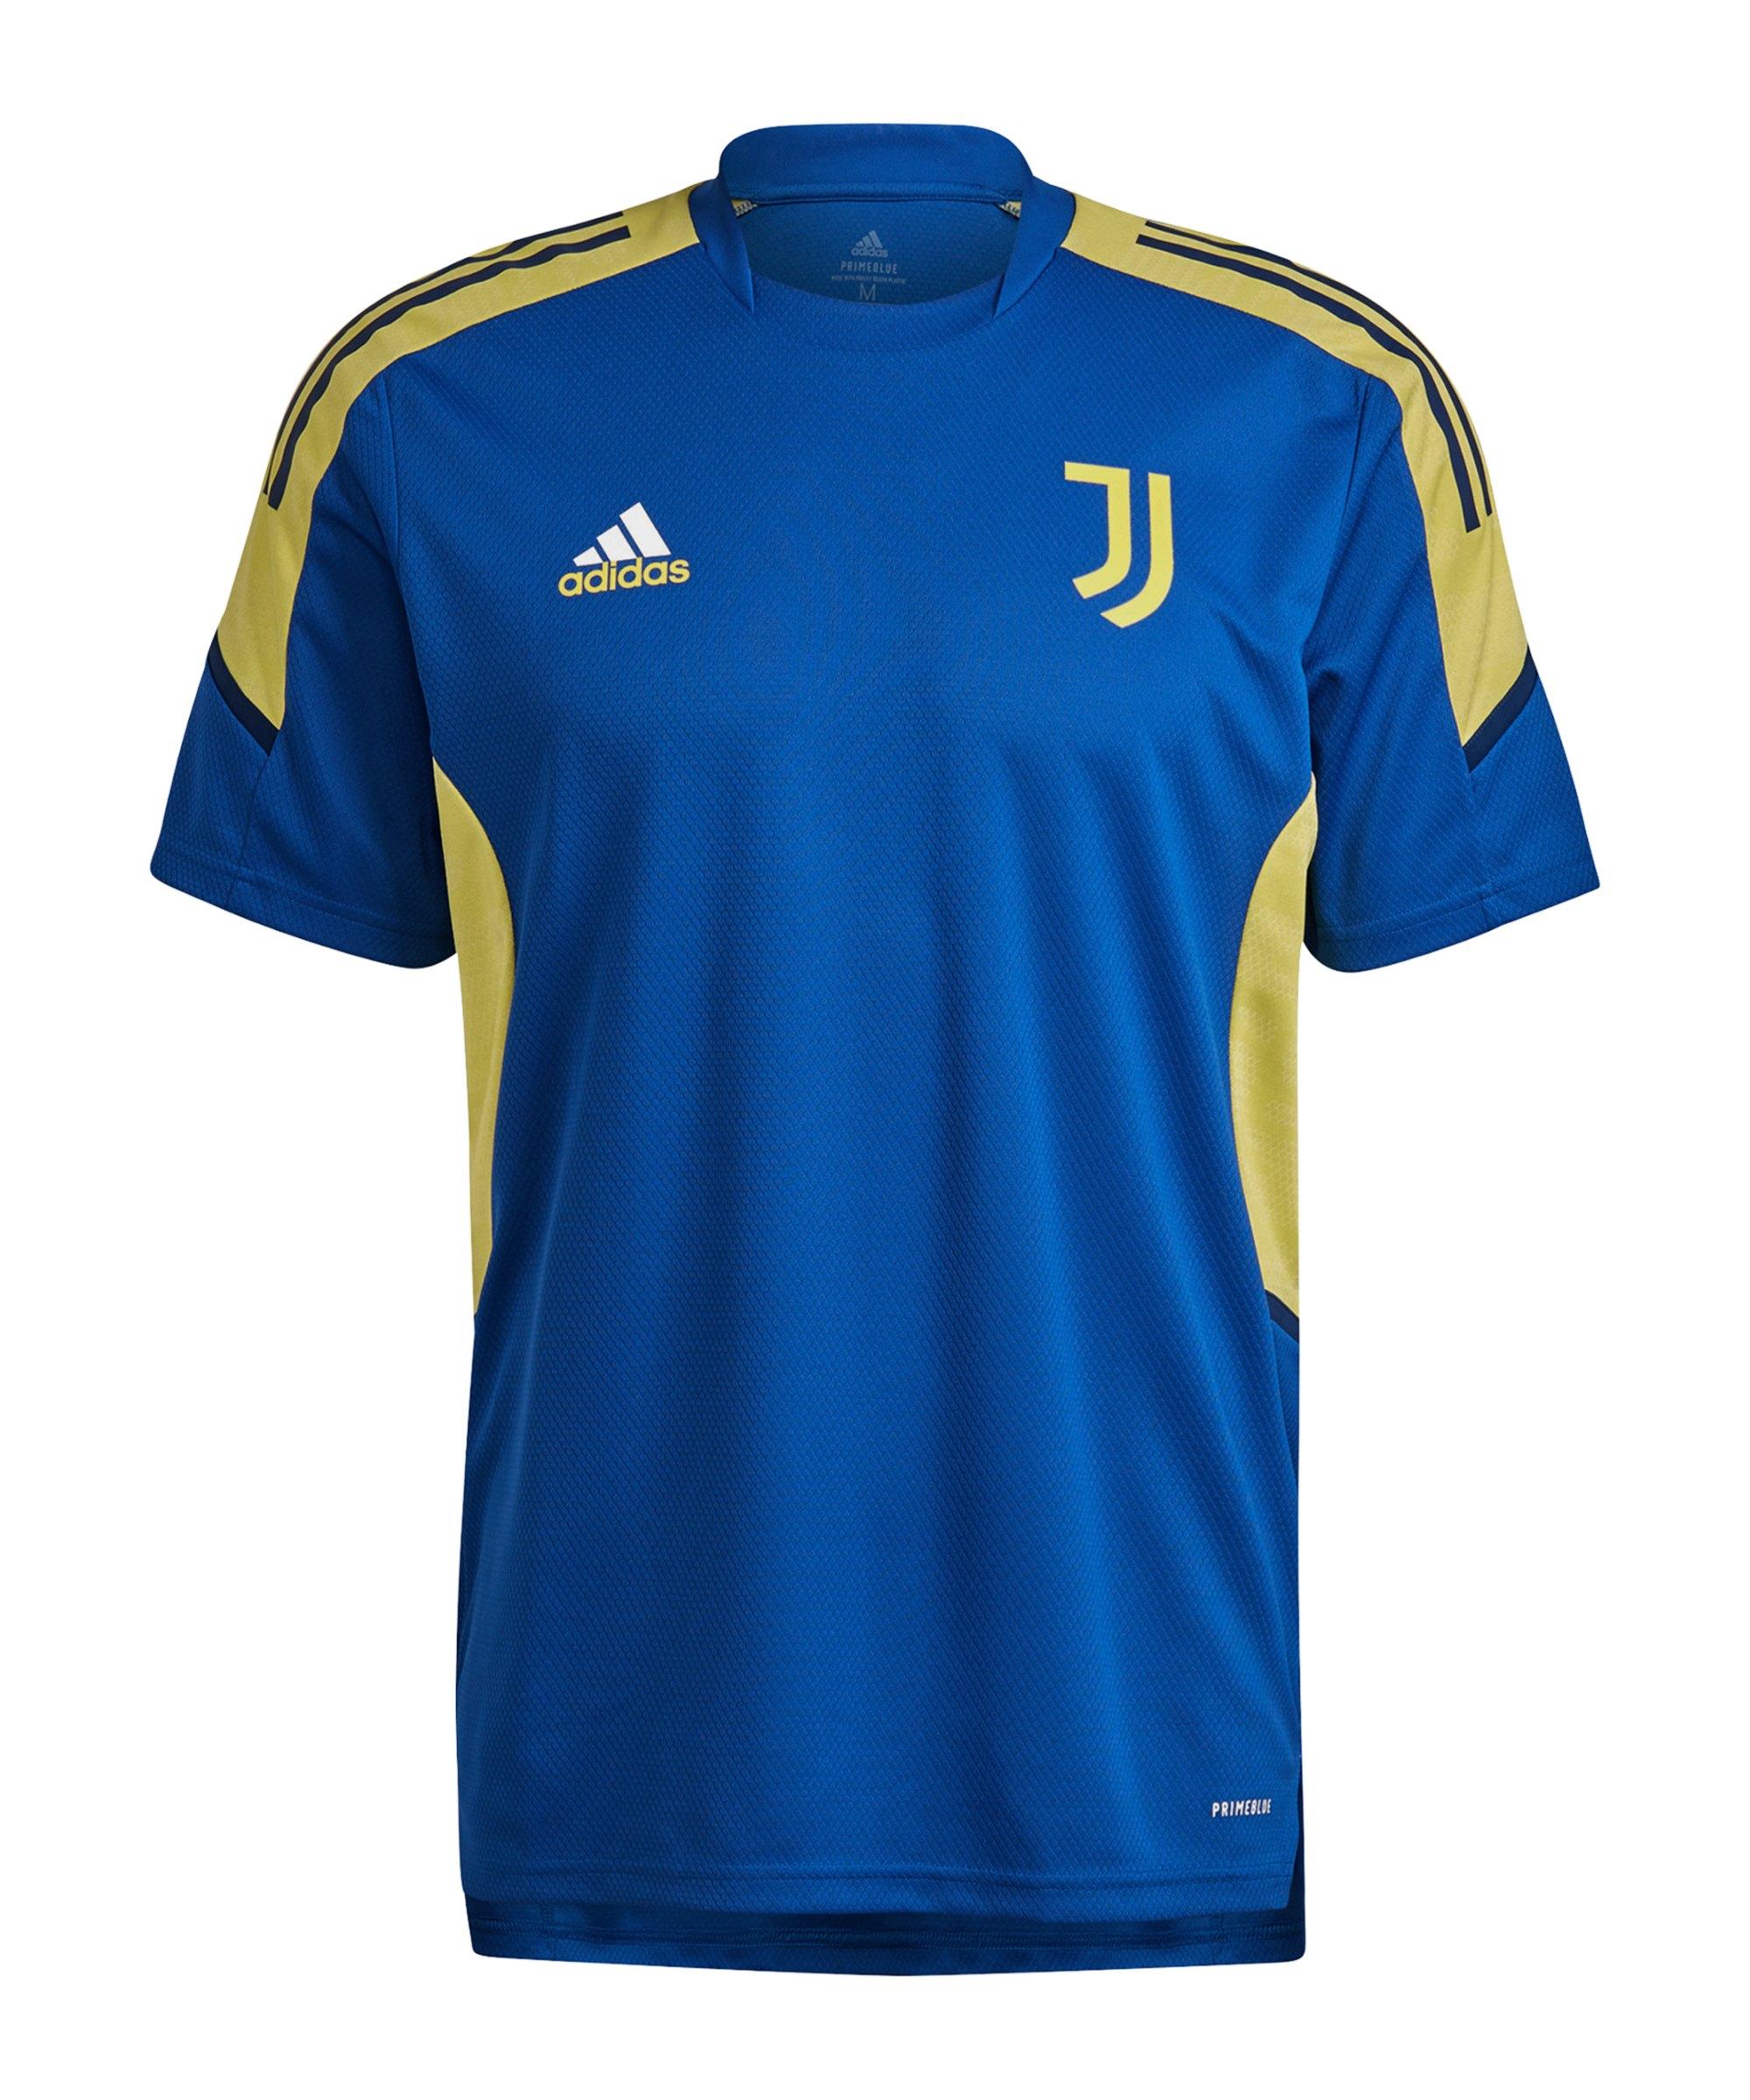 adidas Juventus Turin Trainingsshirt Blau Gelb - blau